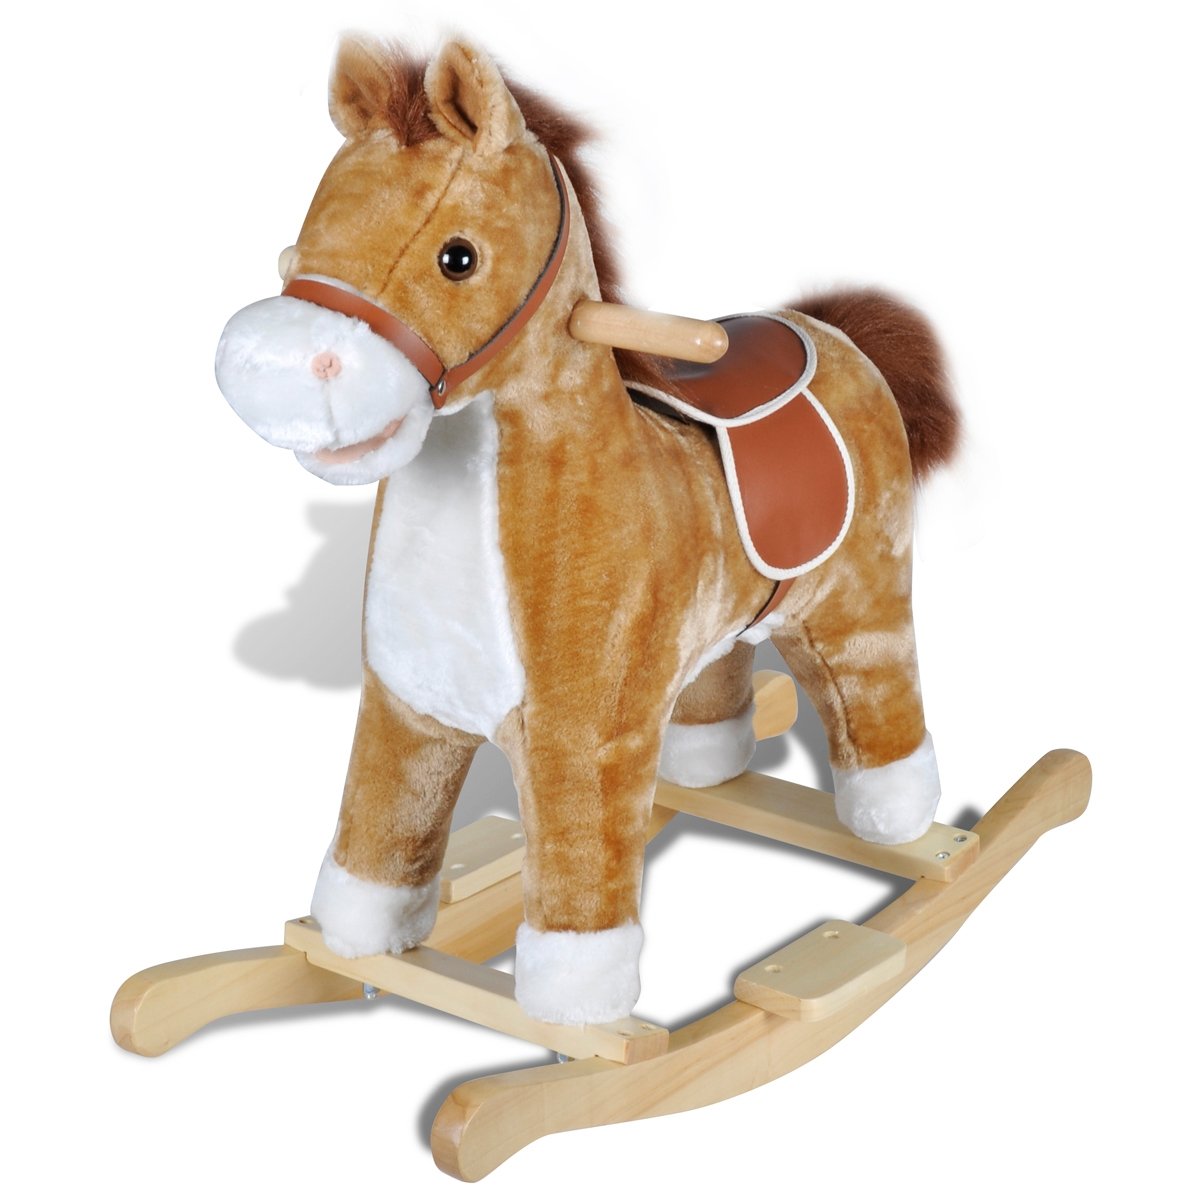 Jouet cheval bebe - zenika 021b0bf02472